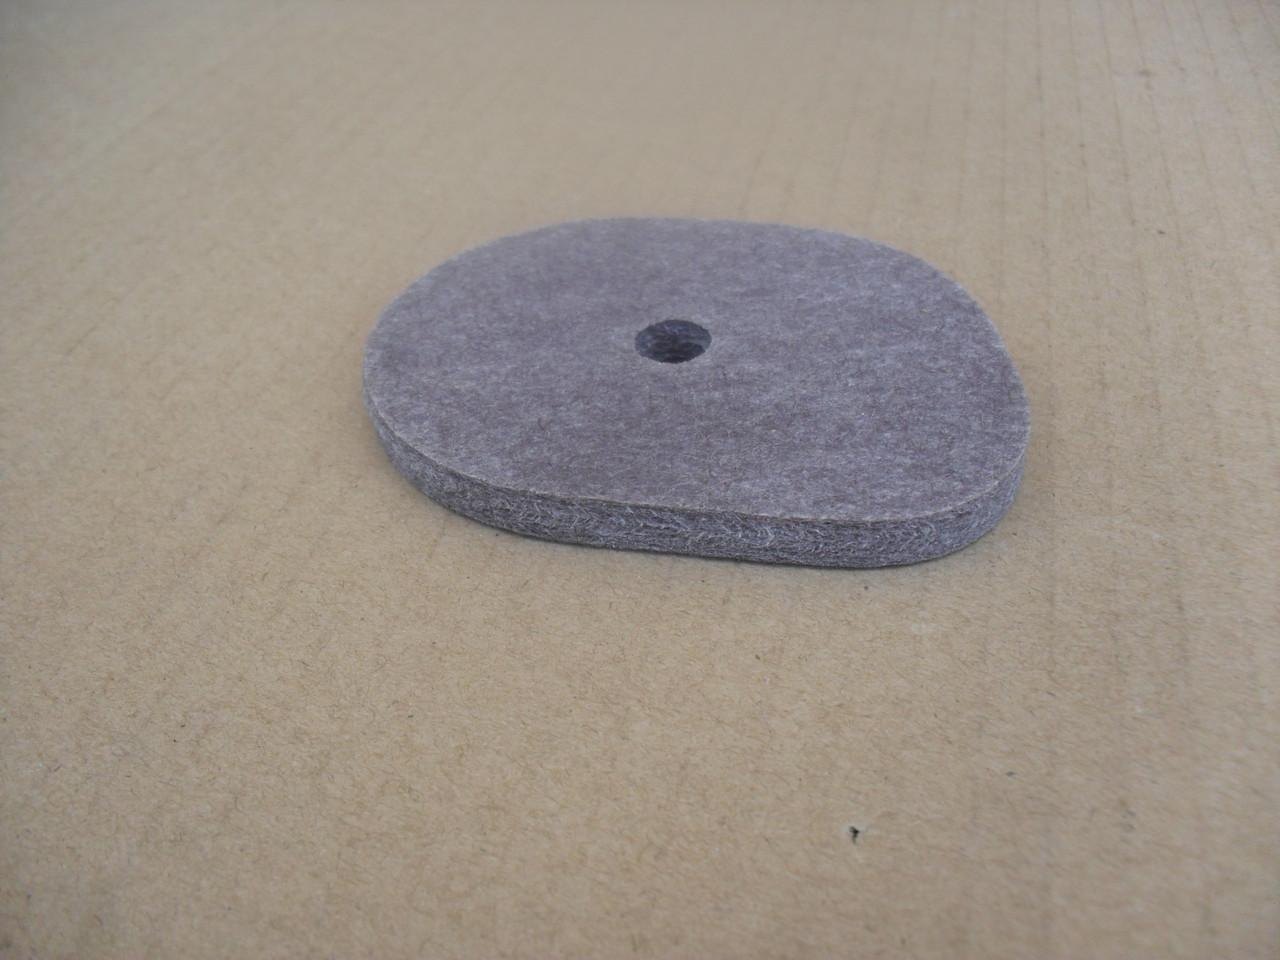 Air Filter For Stihl 4144-124-2800 FC56C FS40C FS50C FS56 FS56R HT56C FC70C FS5